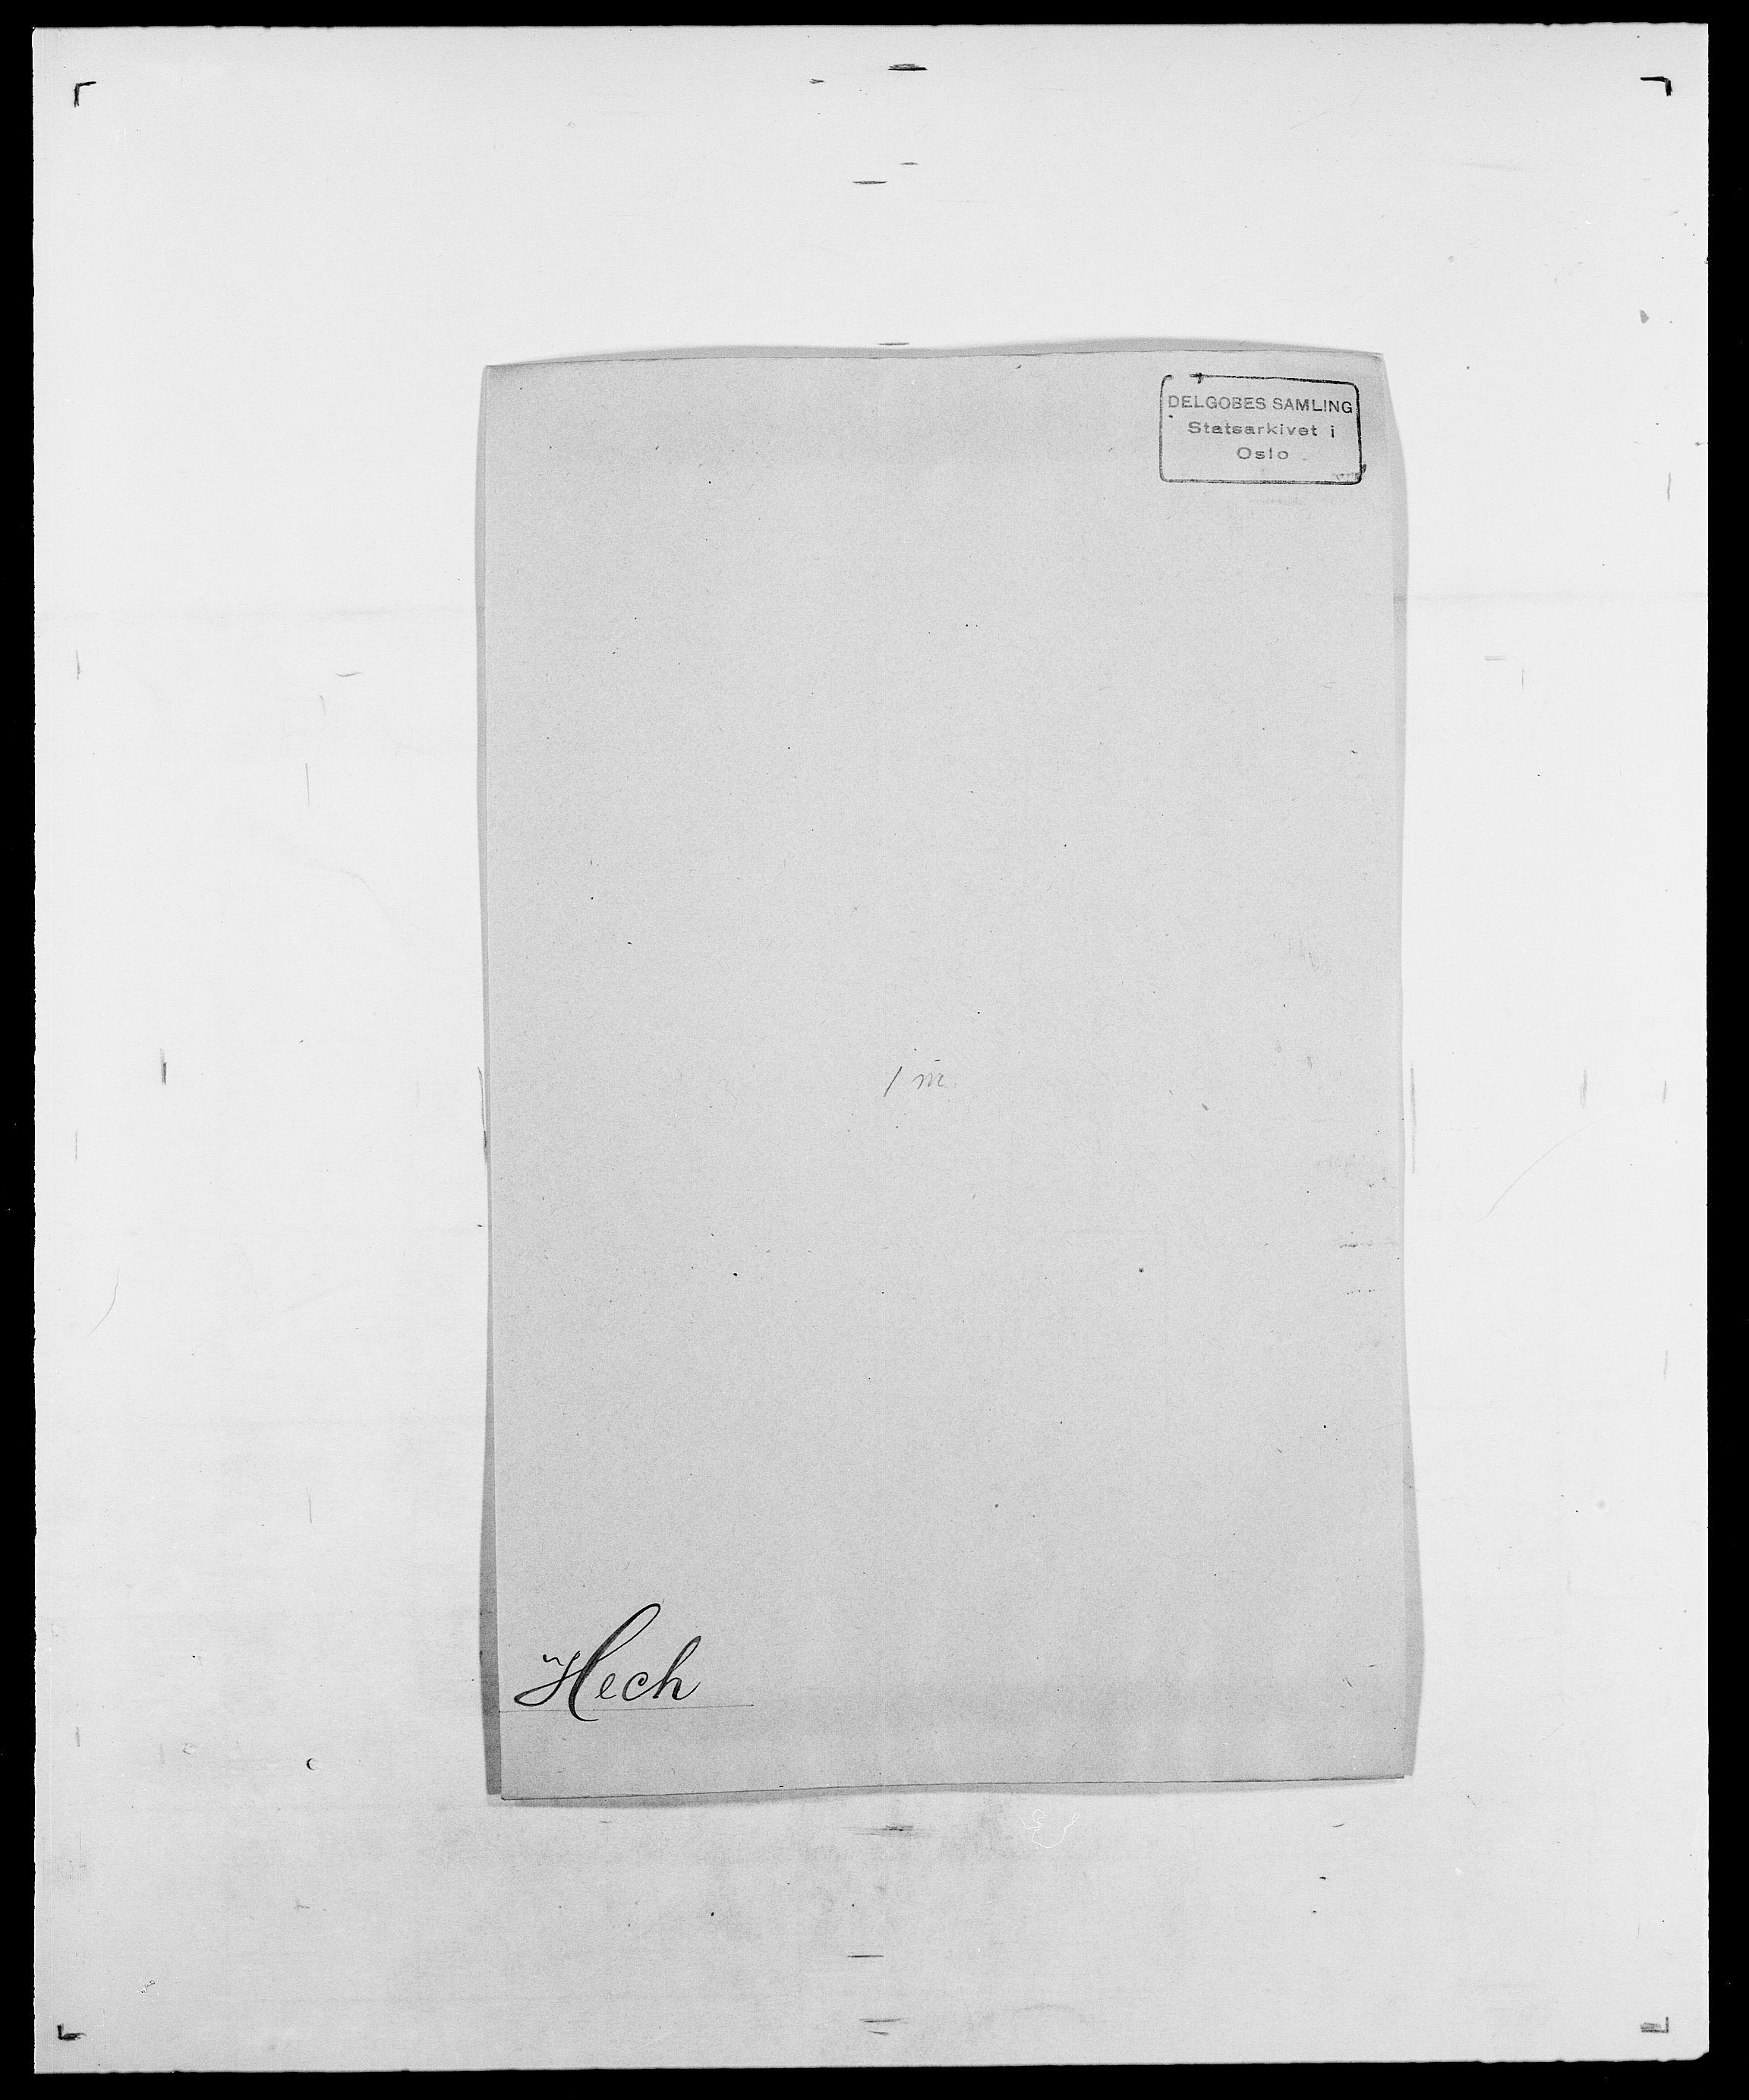 SAO, Delgobe, Charles Antoine - samling, D/Da/L0016: Hamborg - Hektoen, s. 655